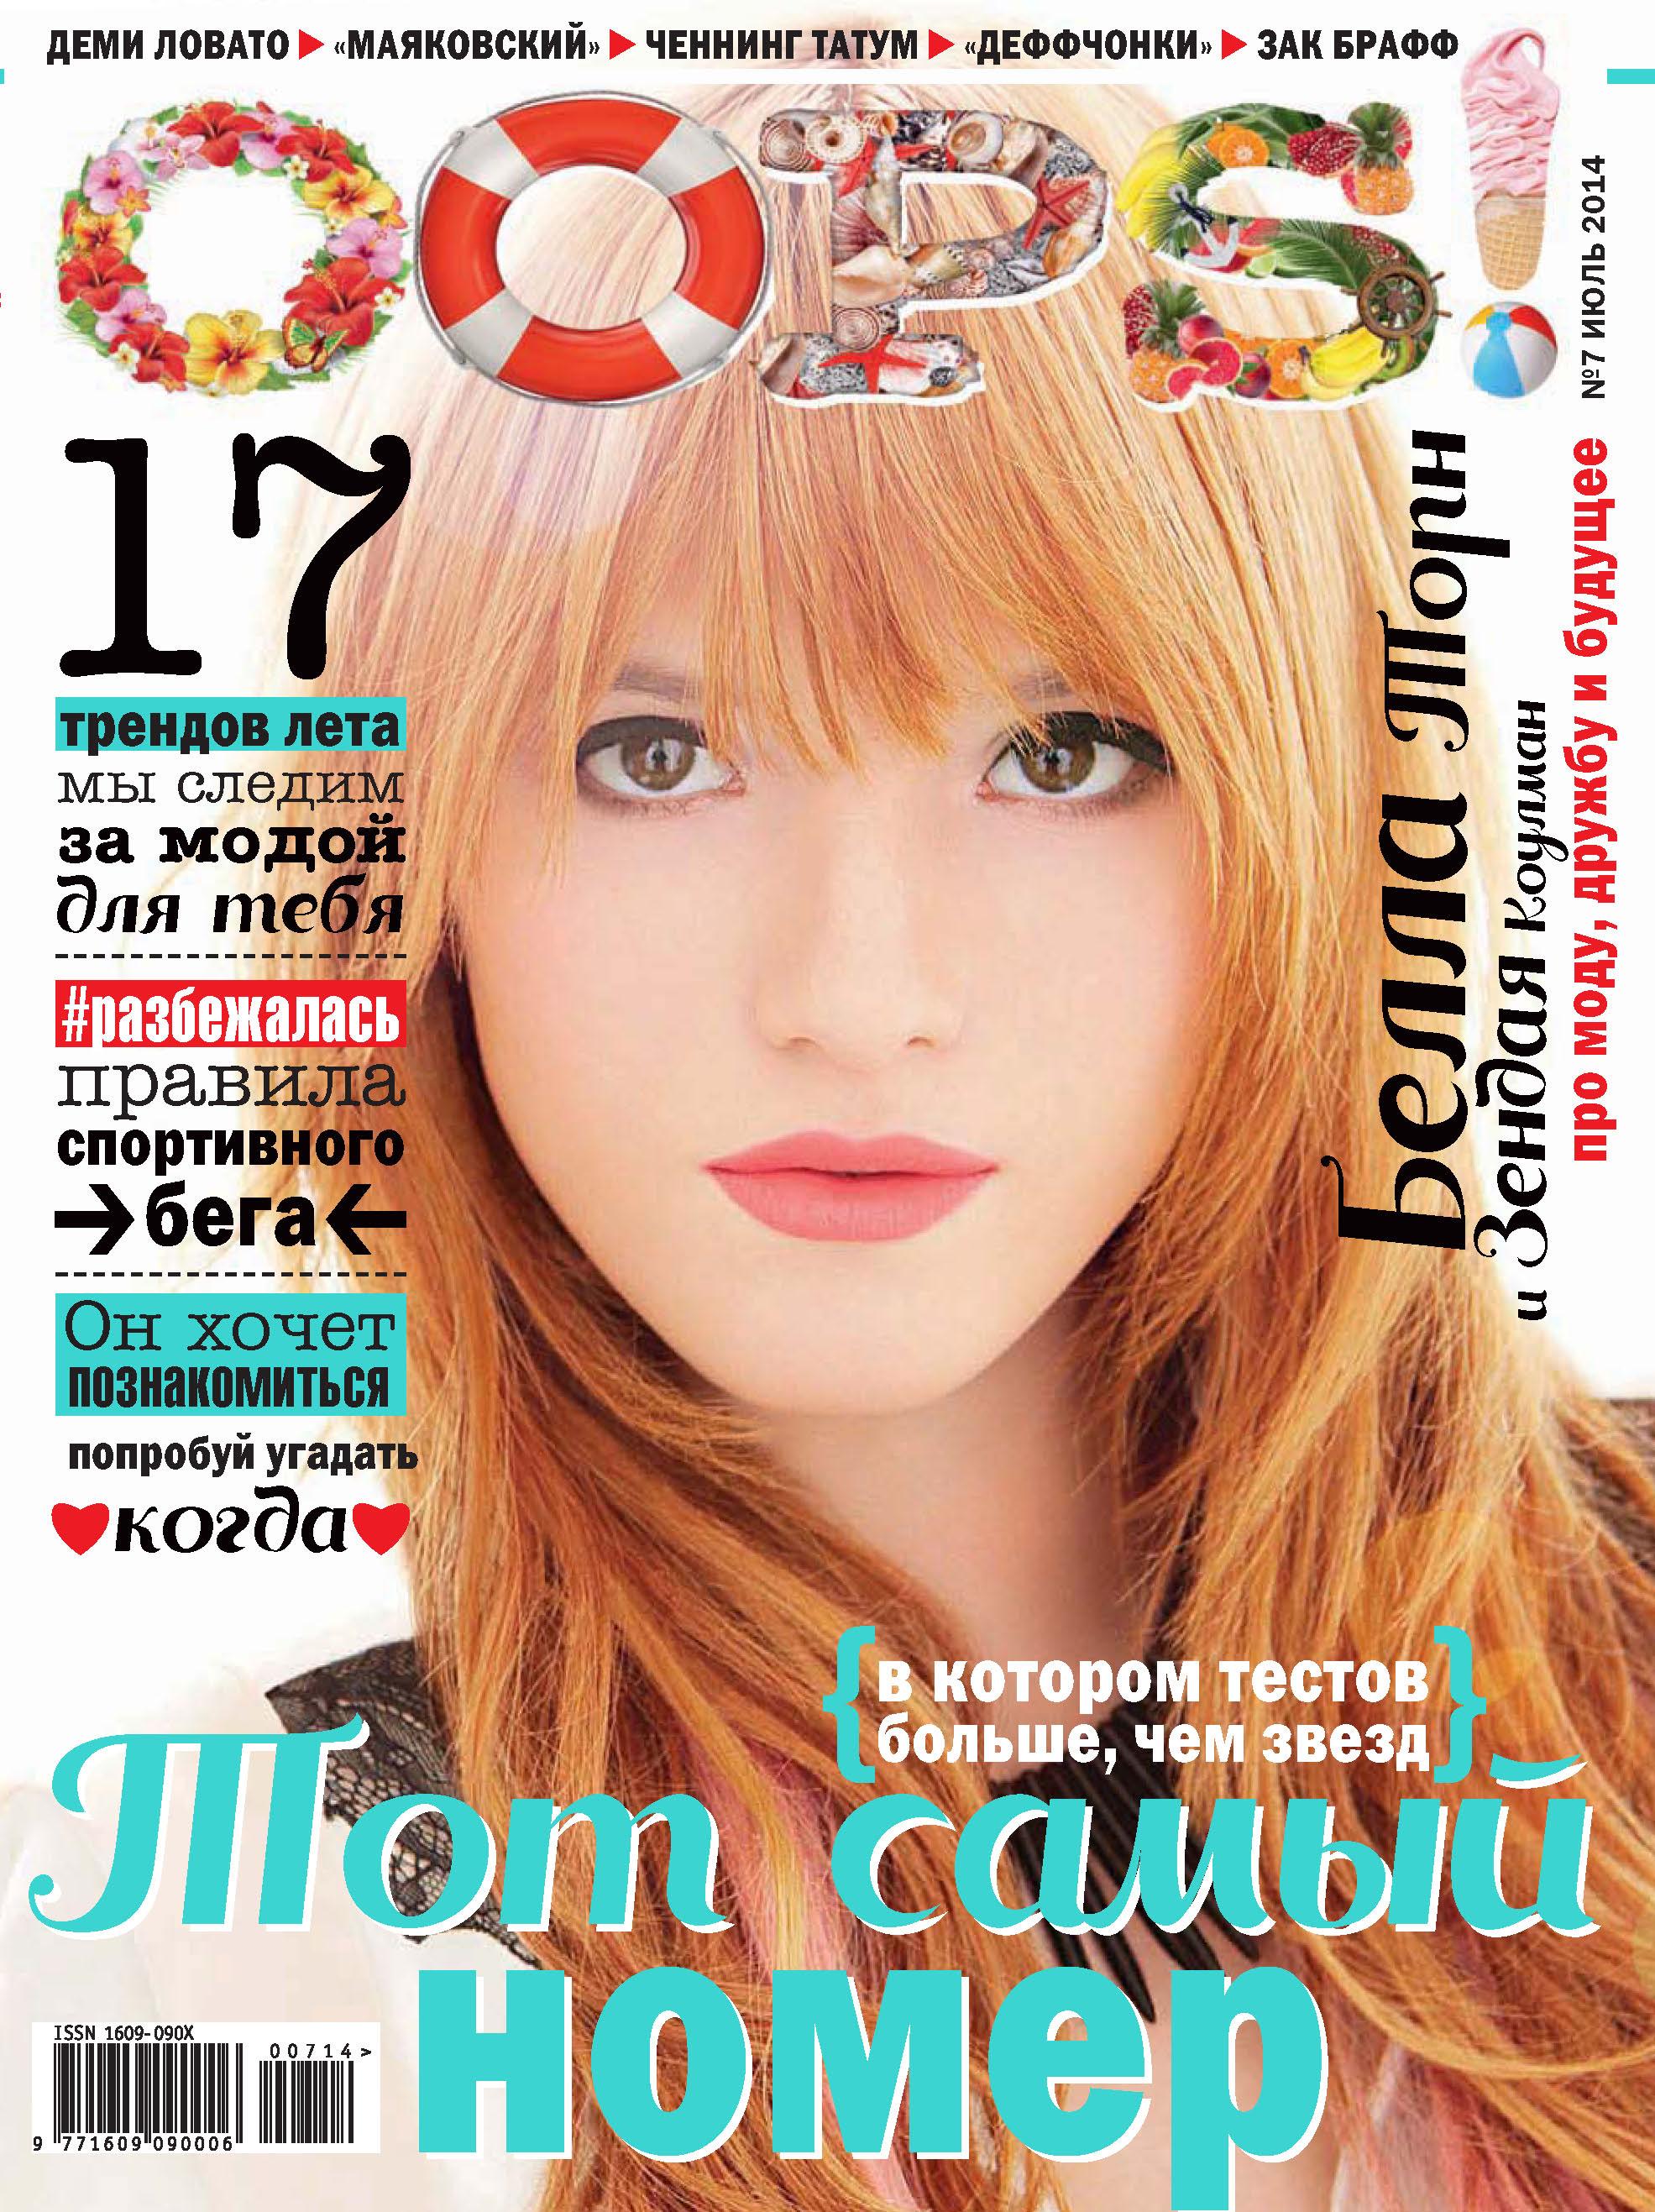 ИД «Бурда» Журнал Oops! №07/2014 журнал oops читать онлайн